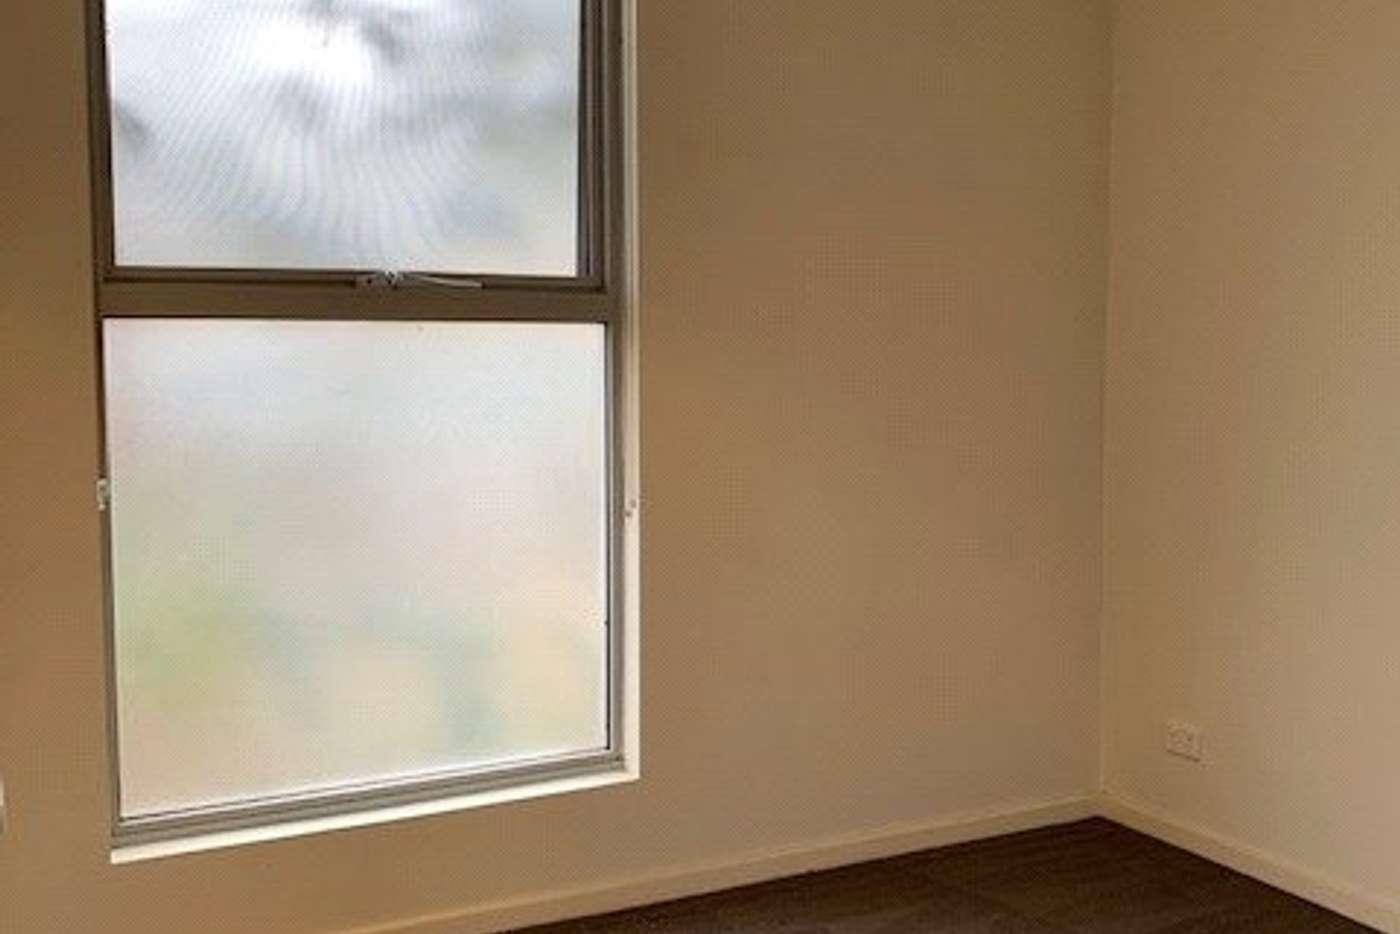 Sixth view of Homely apartment listing, 5/286 Blackburn Road, Glen Waverley VIC 3150